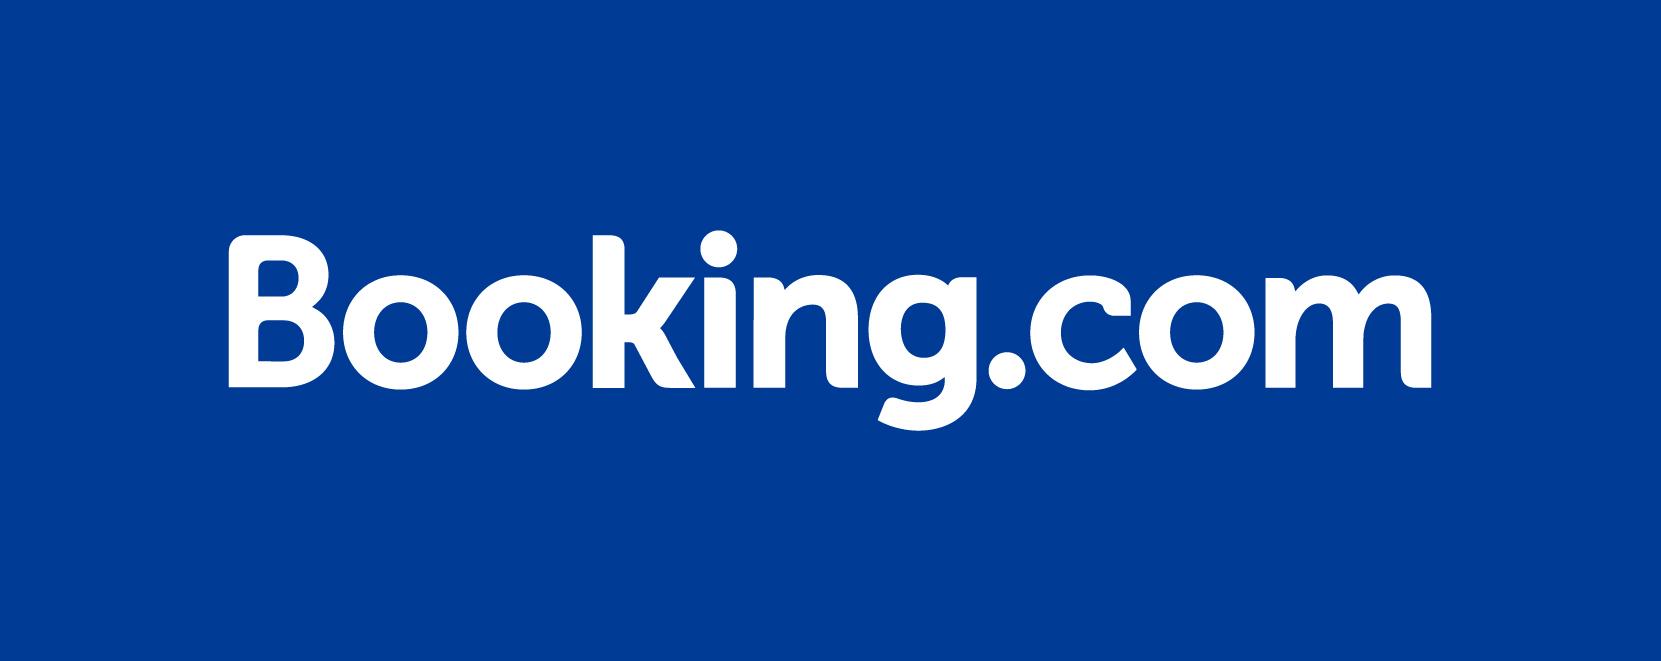 Code promo Booking